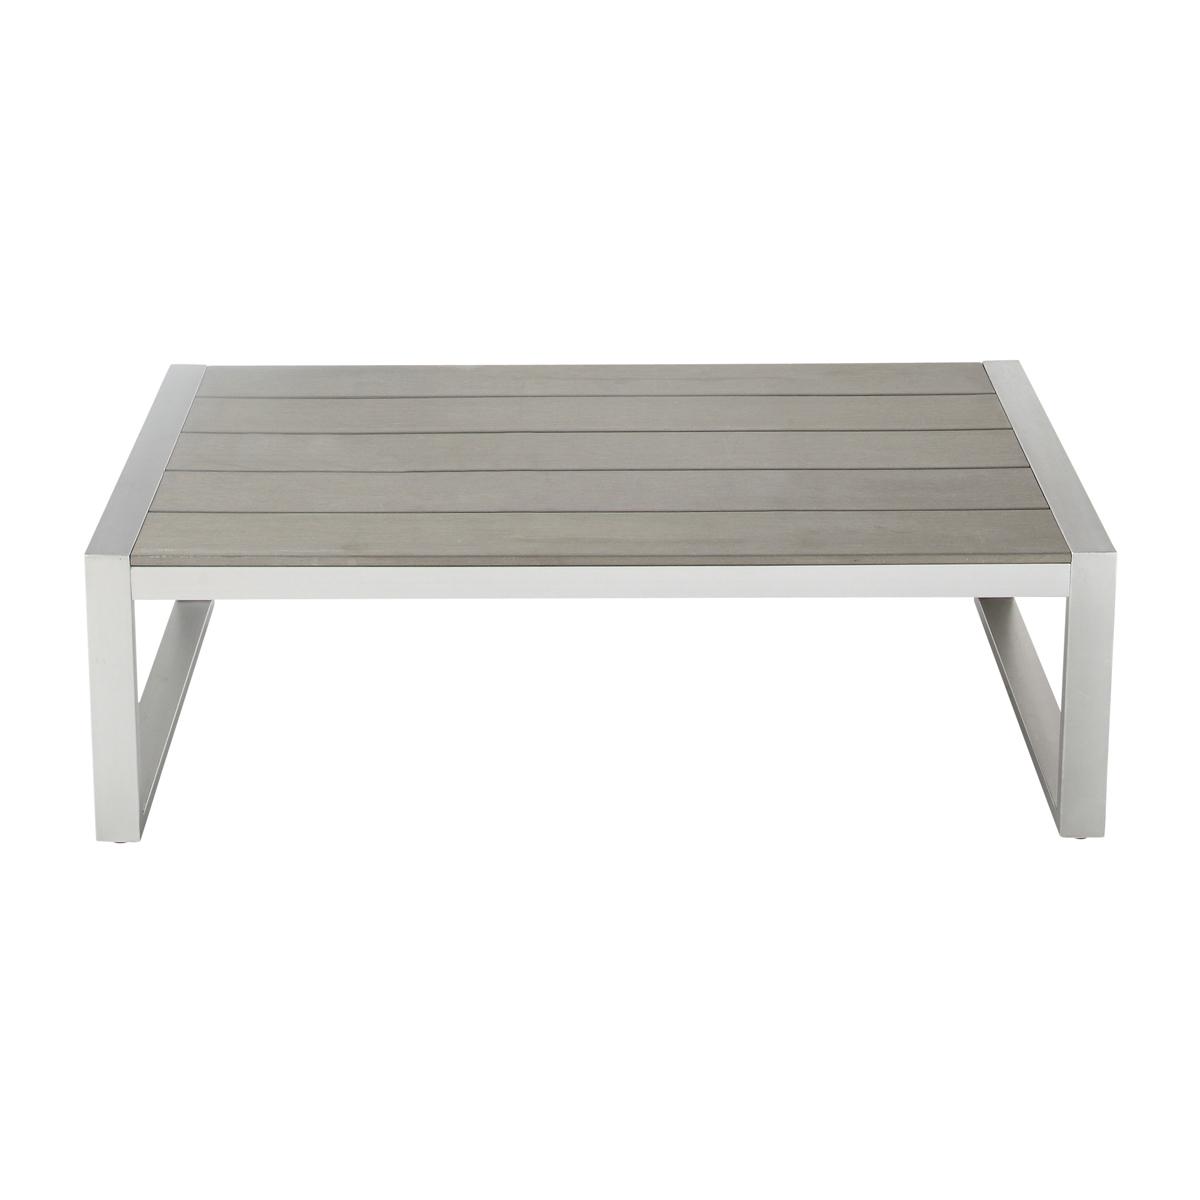 Table Basse De Jardin Originale | Table Basse Jardin D Ulysse Luxe ...